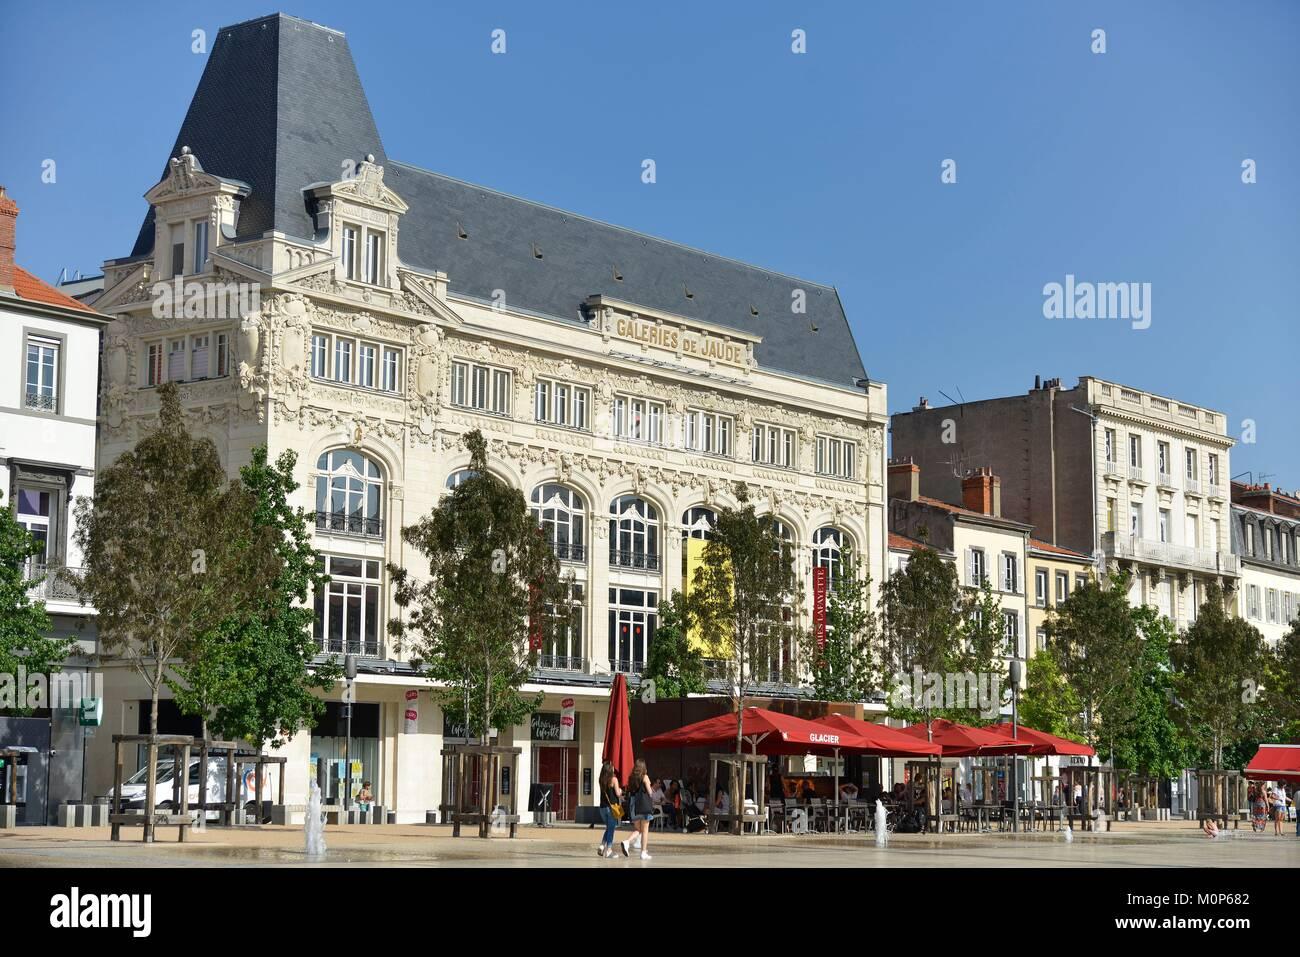 France,Puy de Dome,Clermont Ferrand,type Haussmanien's building on an esplanade - Stock Image